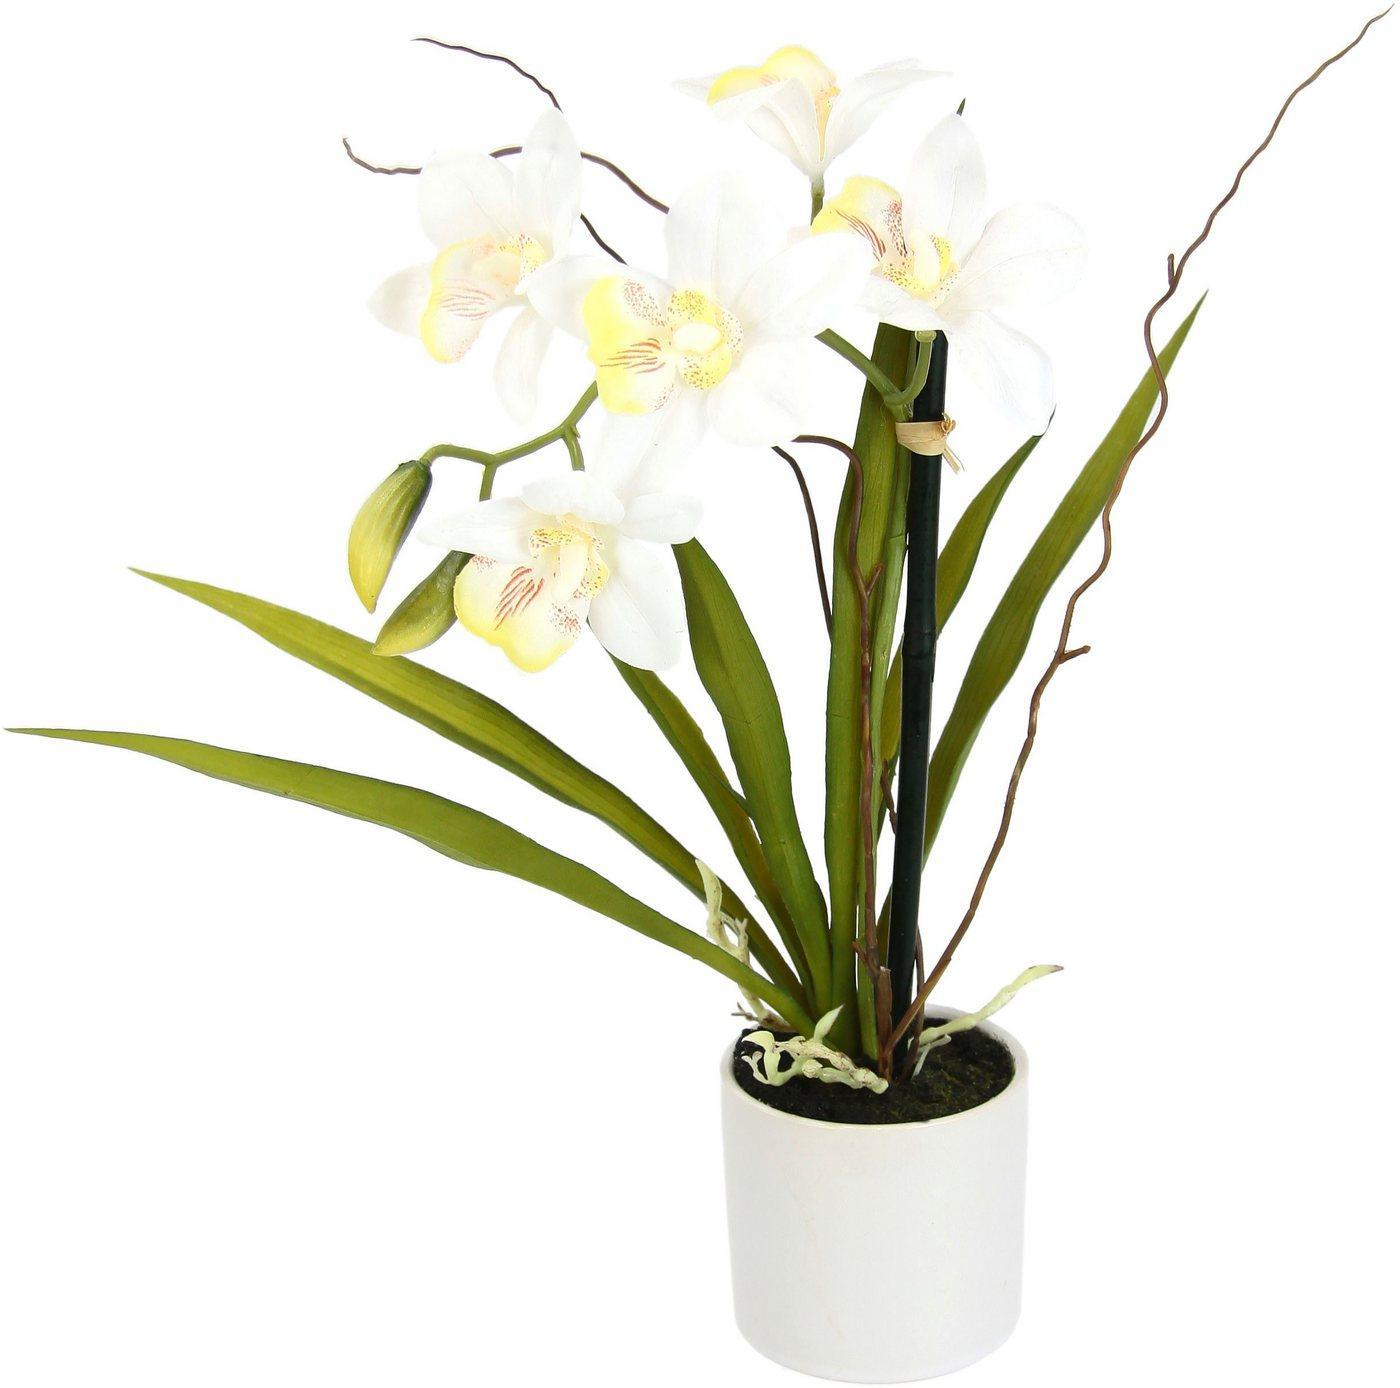 Kunstorchidee »Orchidee«, I.GE.A., Höhe 33 cm, im Keramiktopf, beige